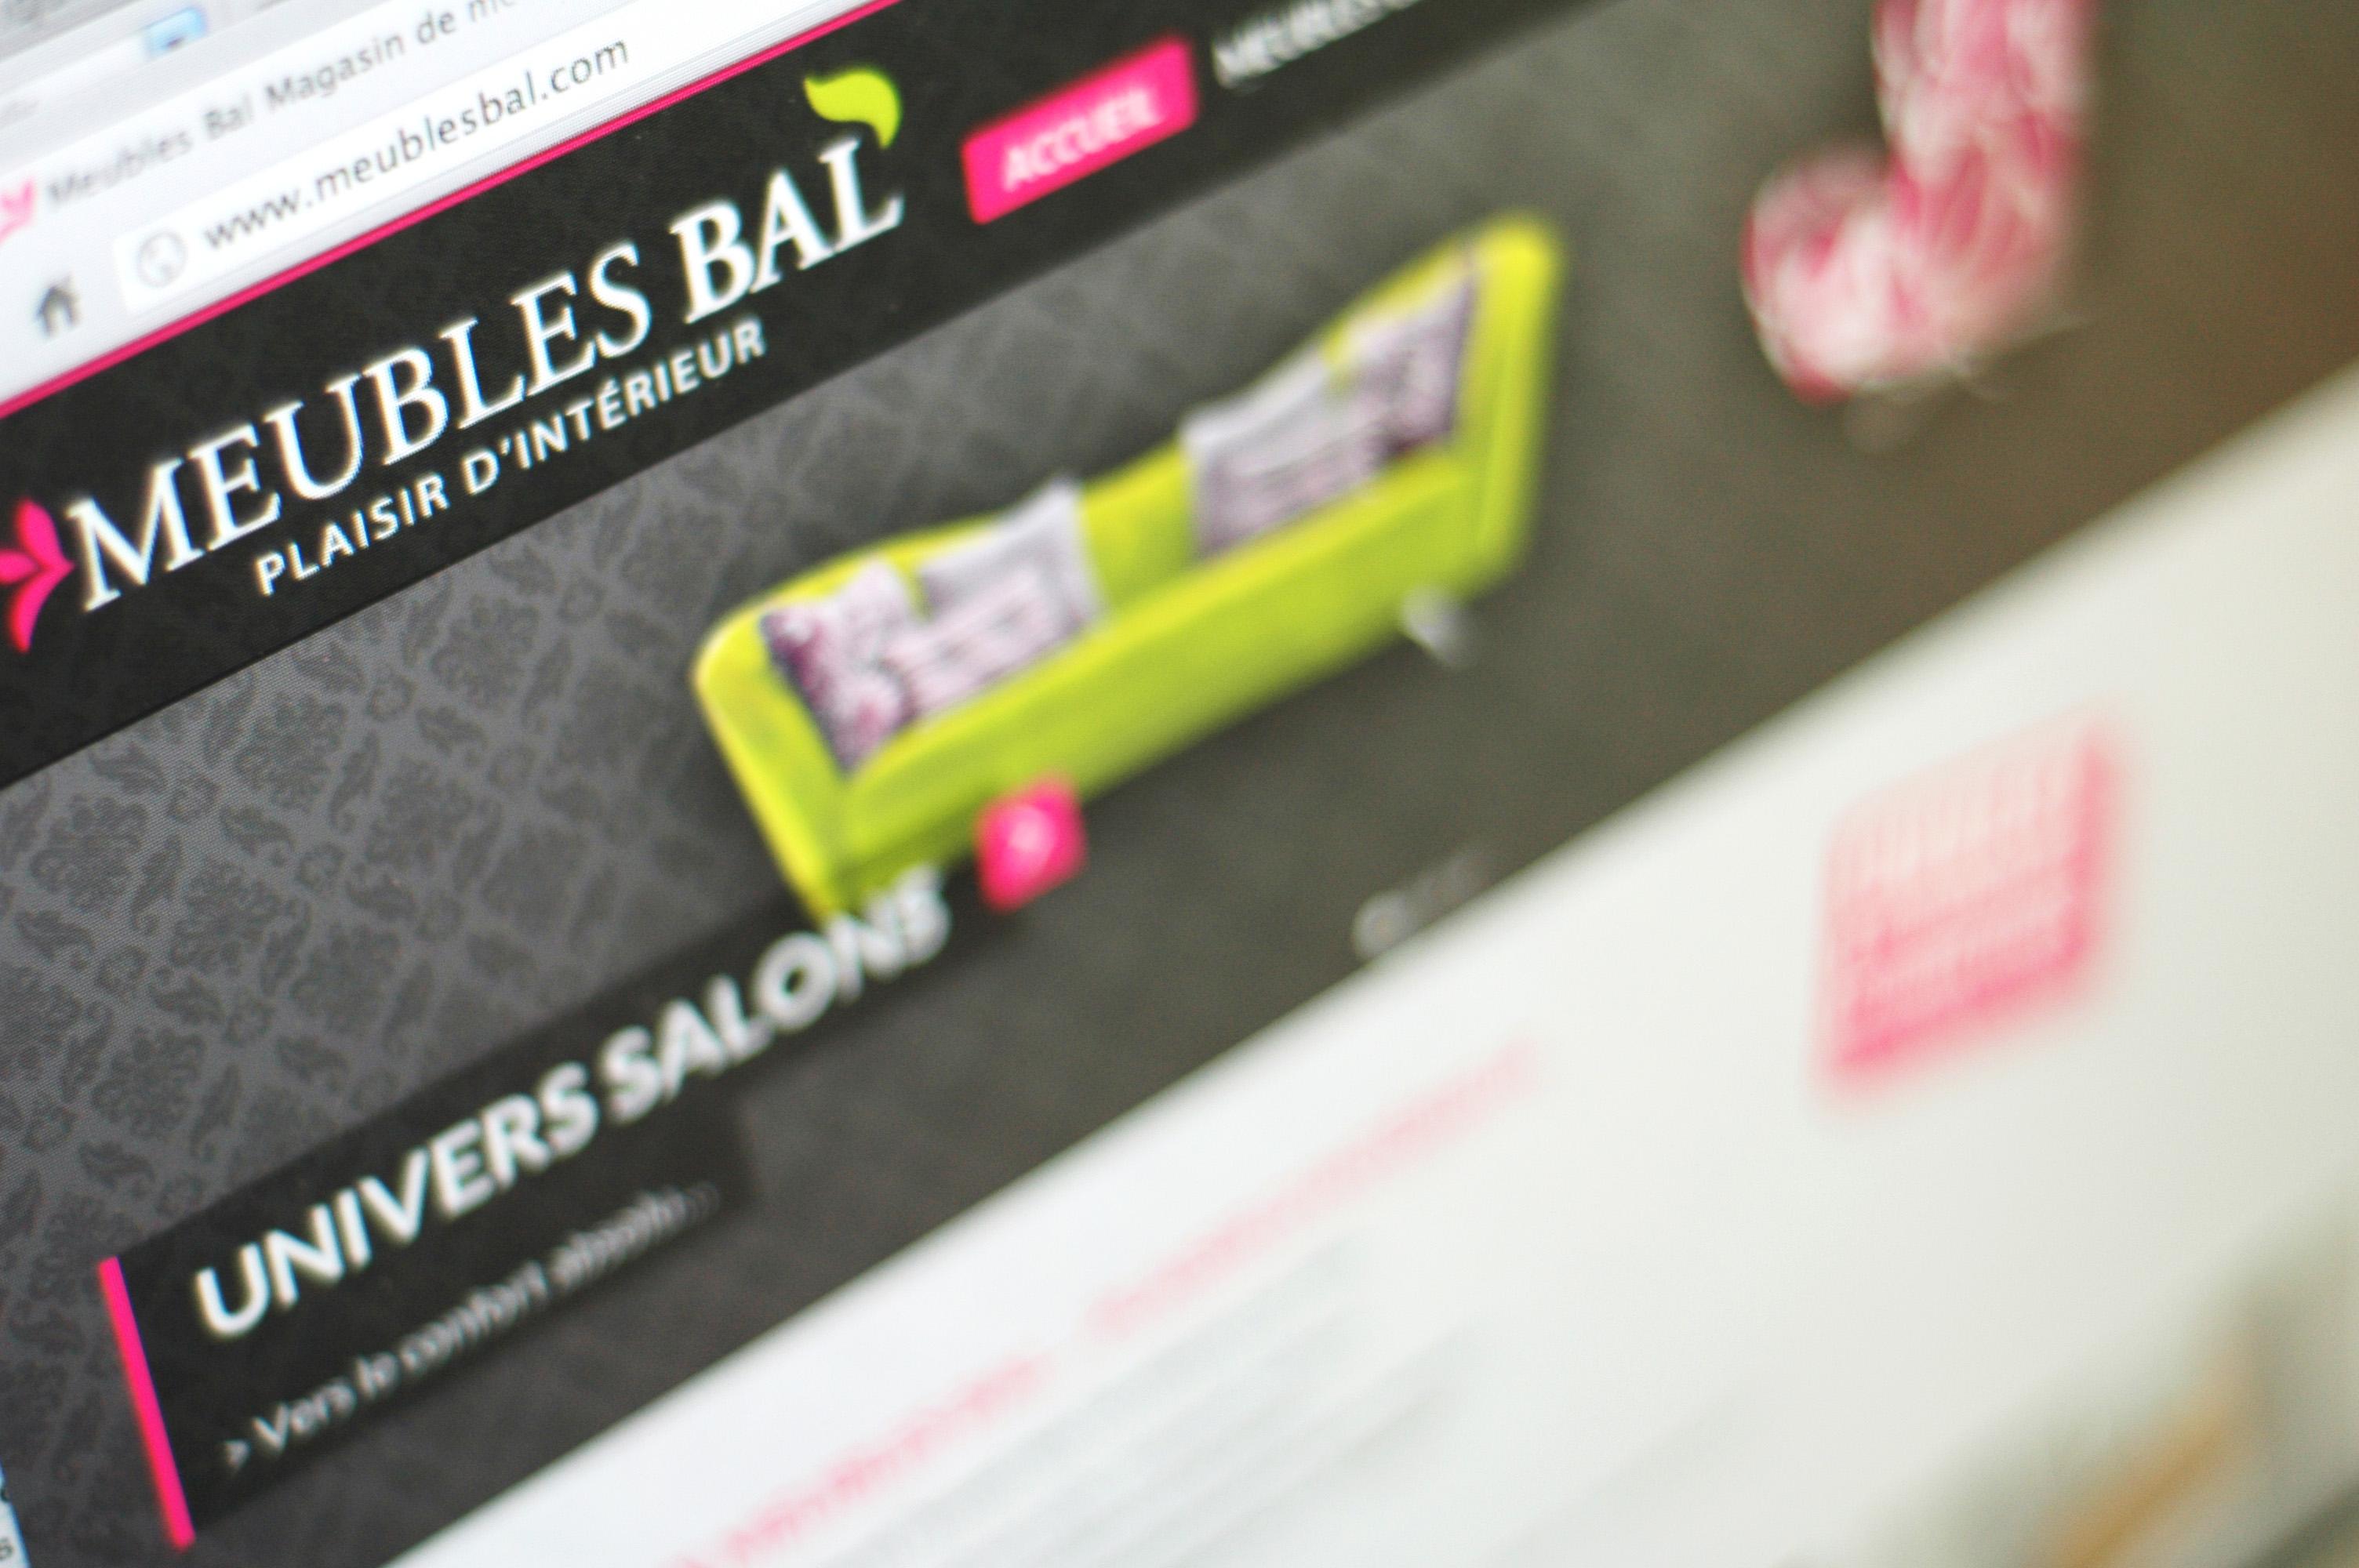 création de site web Calais nord pas-de-calais 59/62 design de site web wordpress Meubles BAL